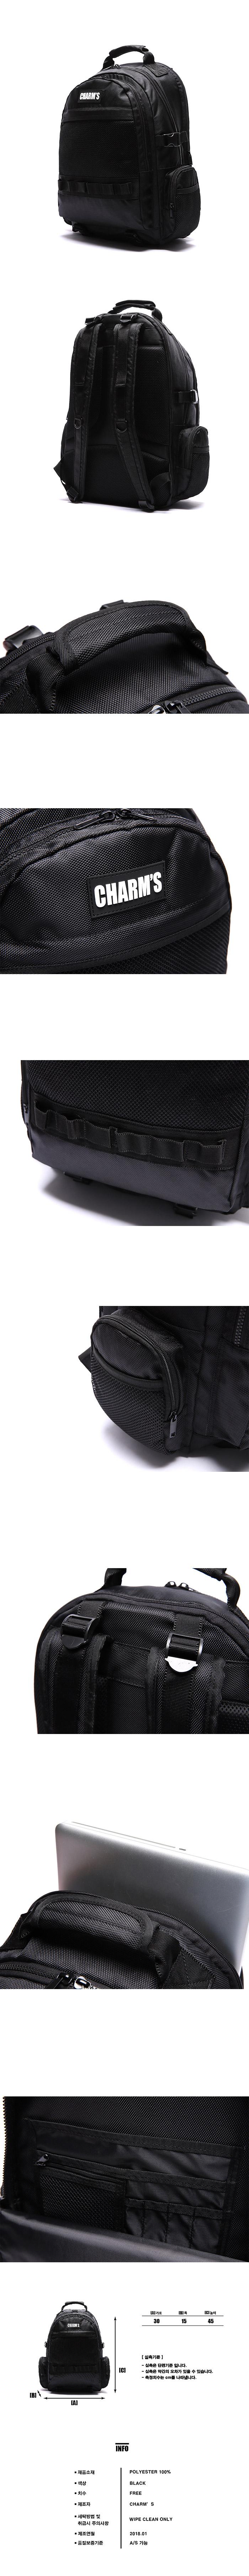 L3-LOGO-3-POCKET-bag.jpg